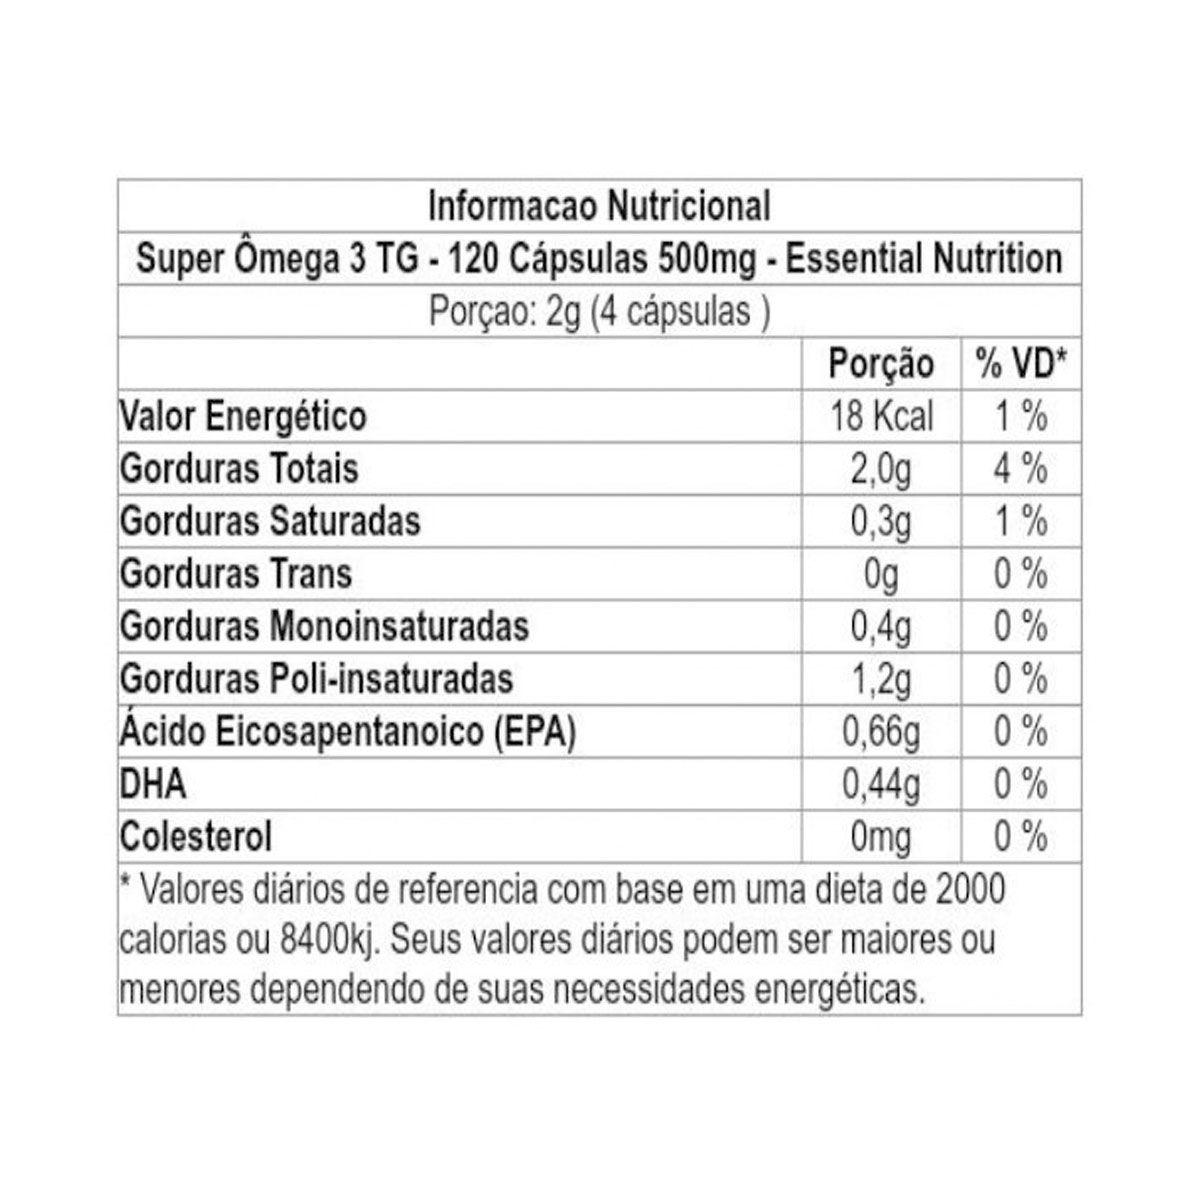 Super Omega 3 500mg 120 caps - Essential Nutrition